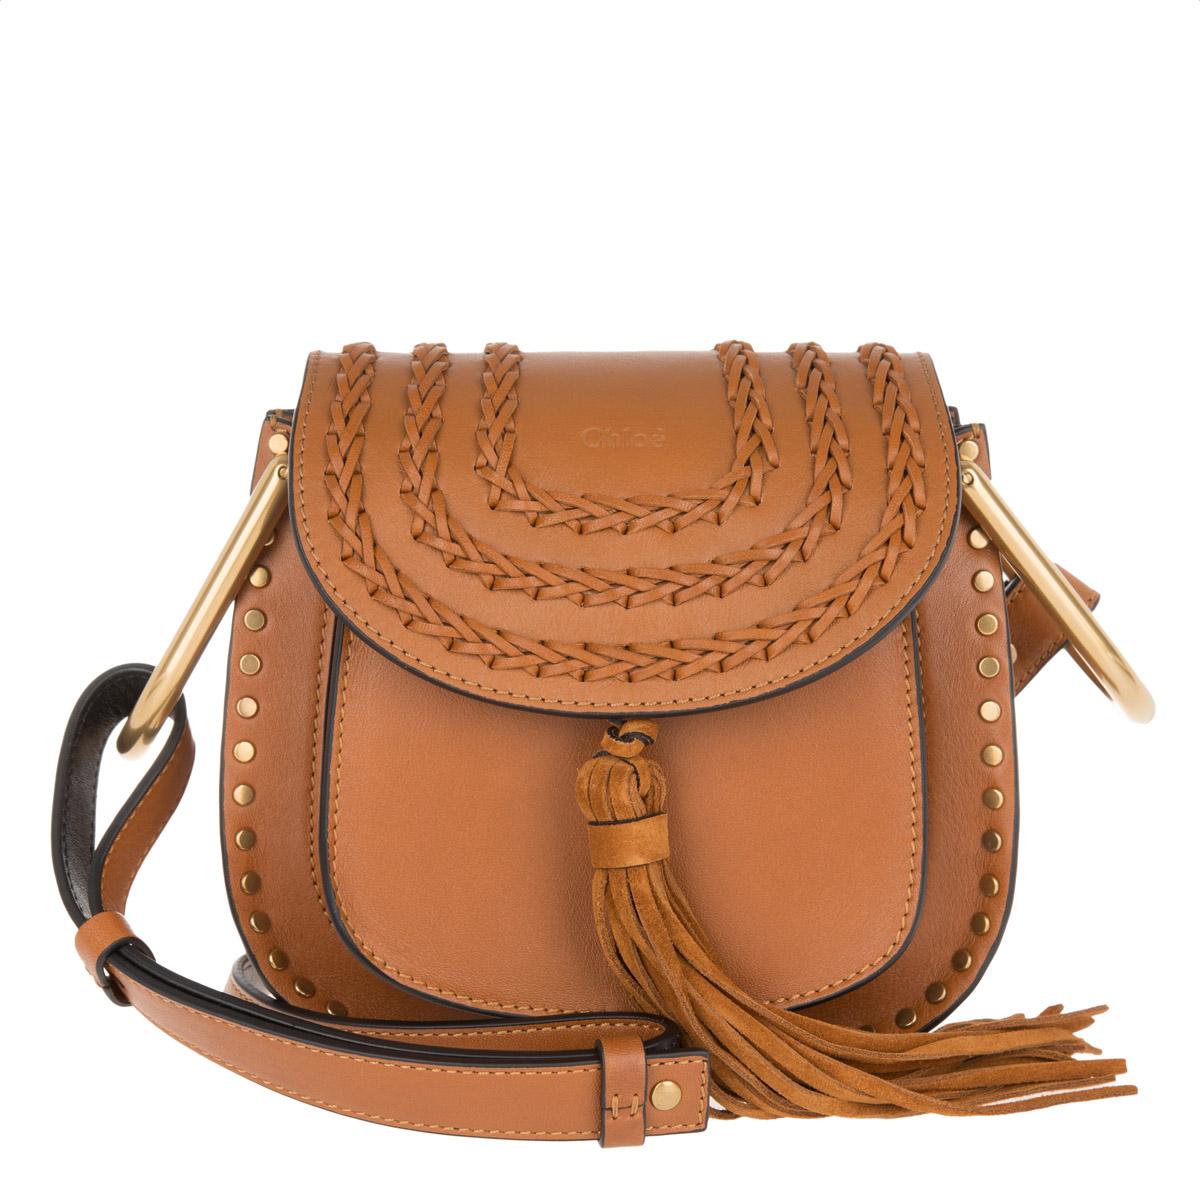 Fashionette Chloé Saddle Bag